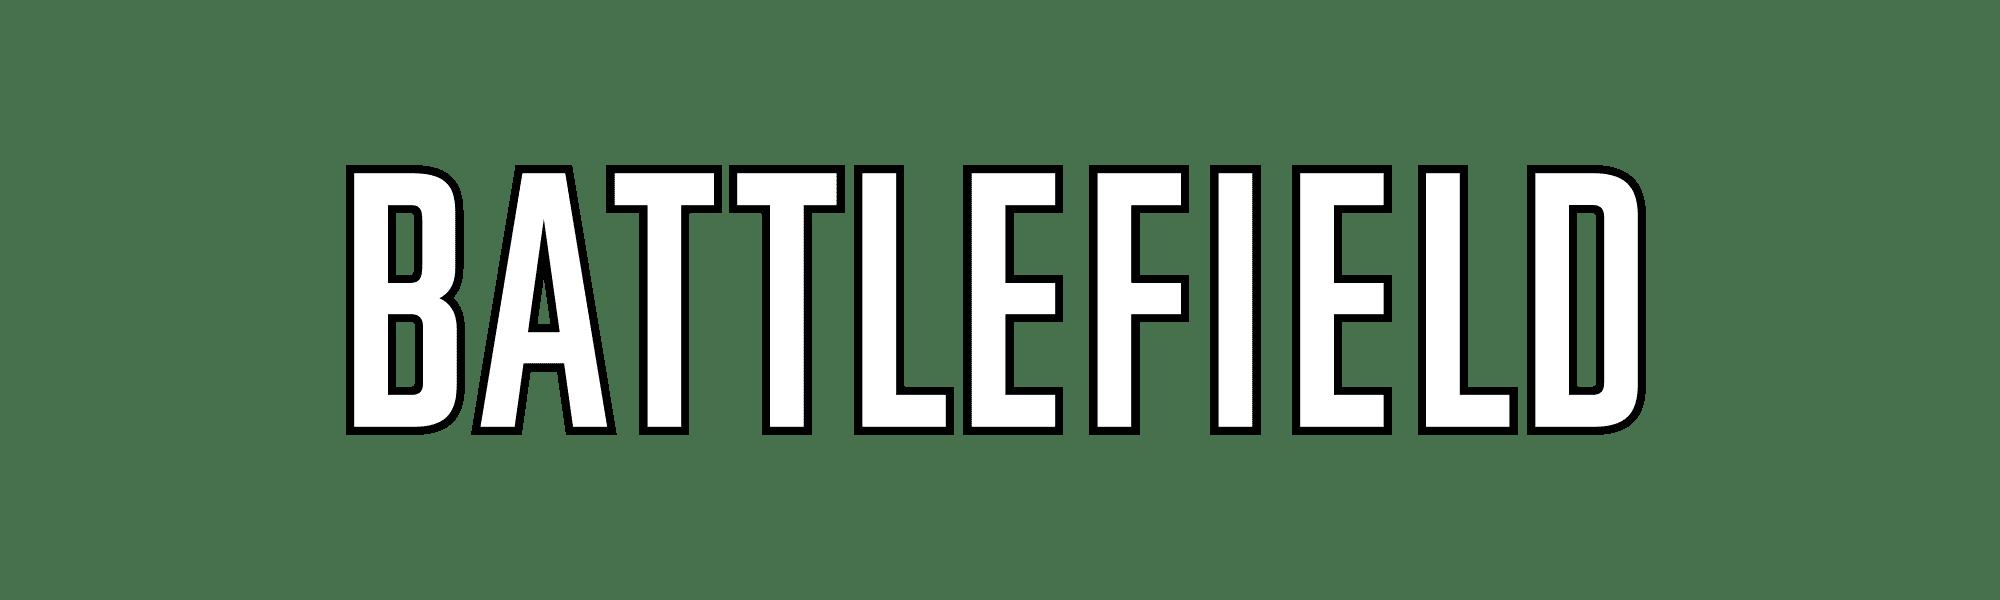 Battlefield Logos Battlefield Game Logo